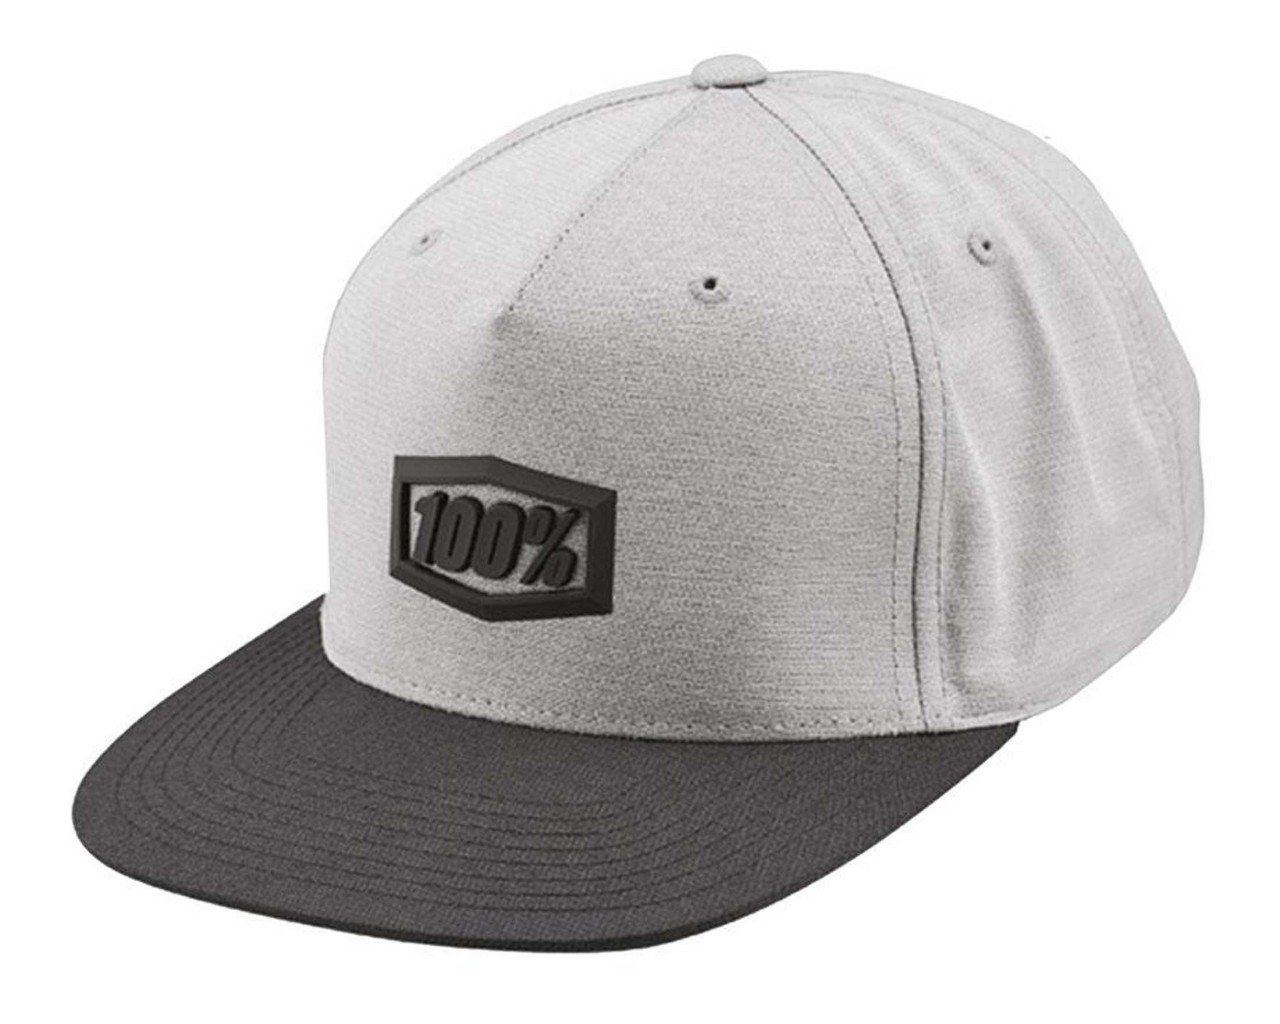 100% Enterprise 2019 Snapback Hat | charcoal